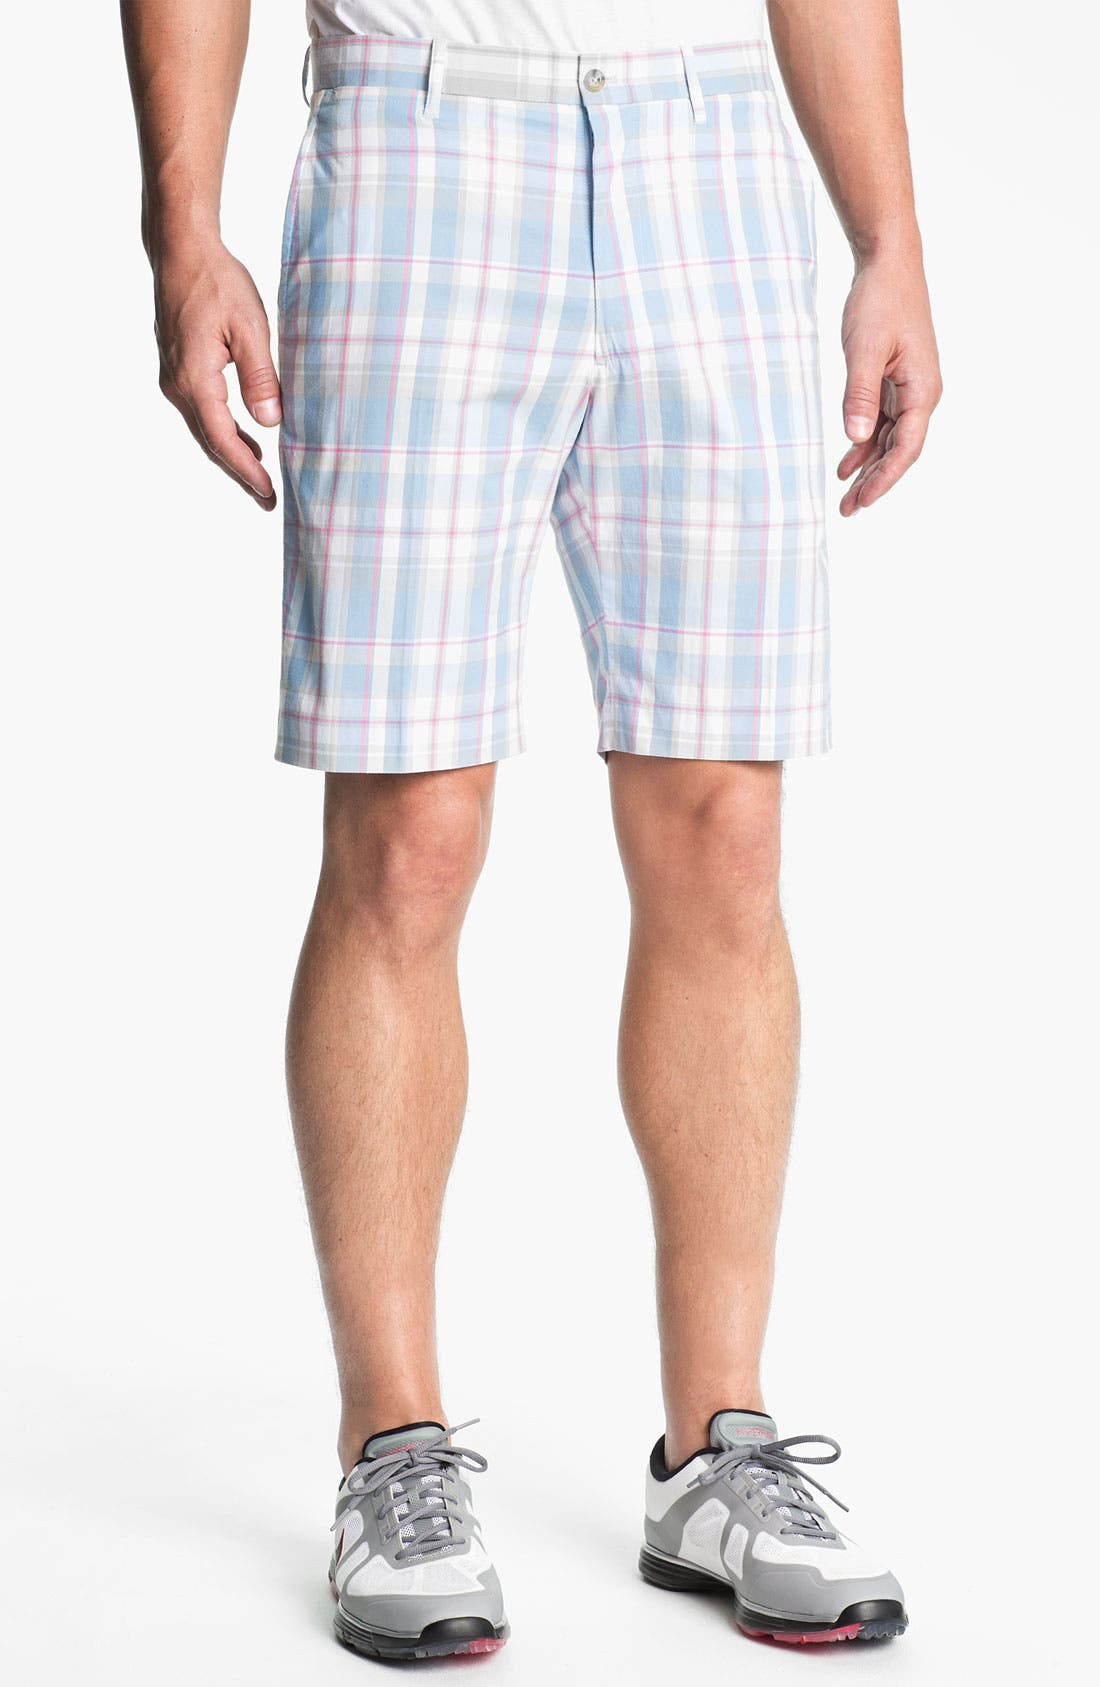 Alternate Image 1 Selected - Bobby Jones Flat Front Golf Shorts